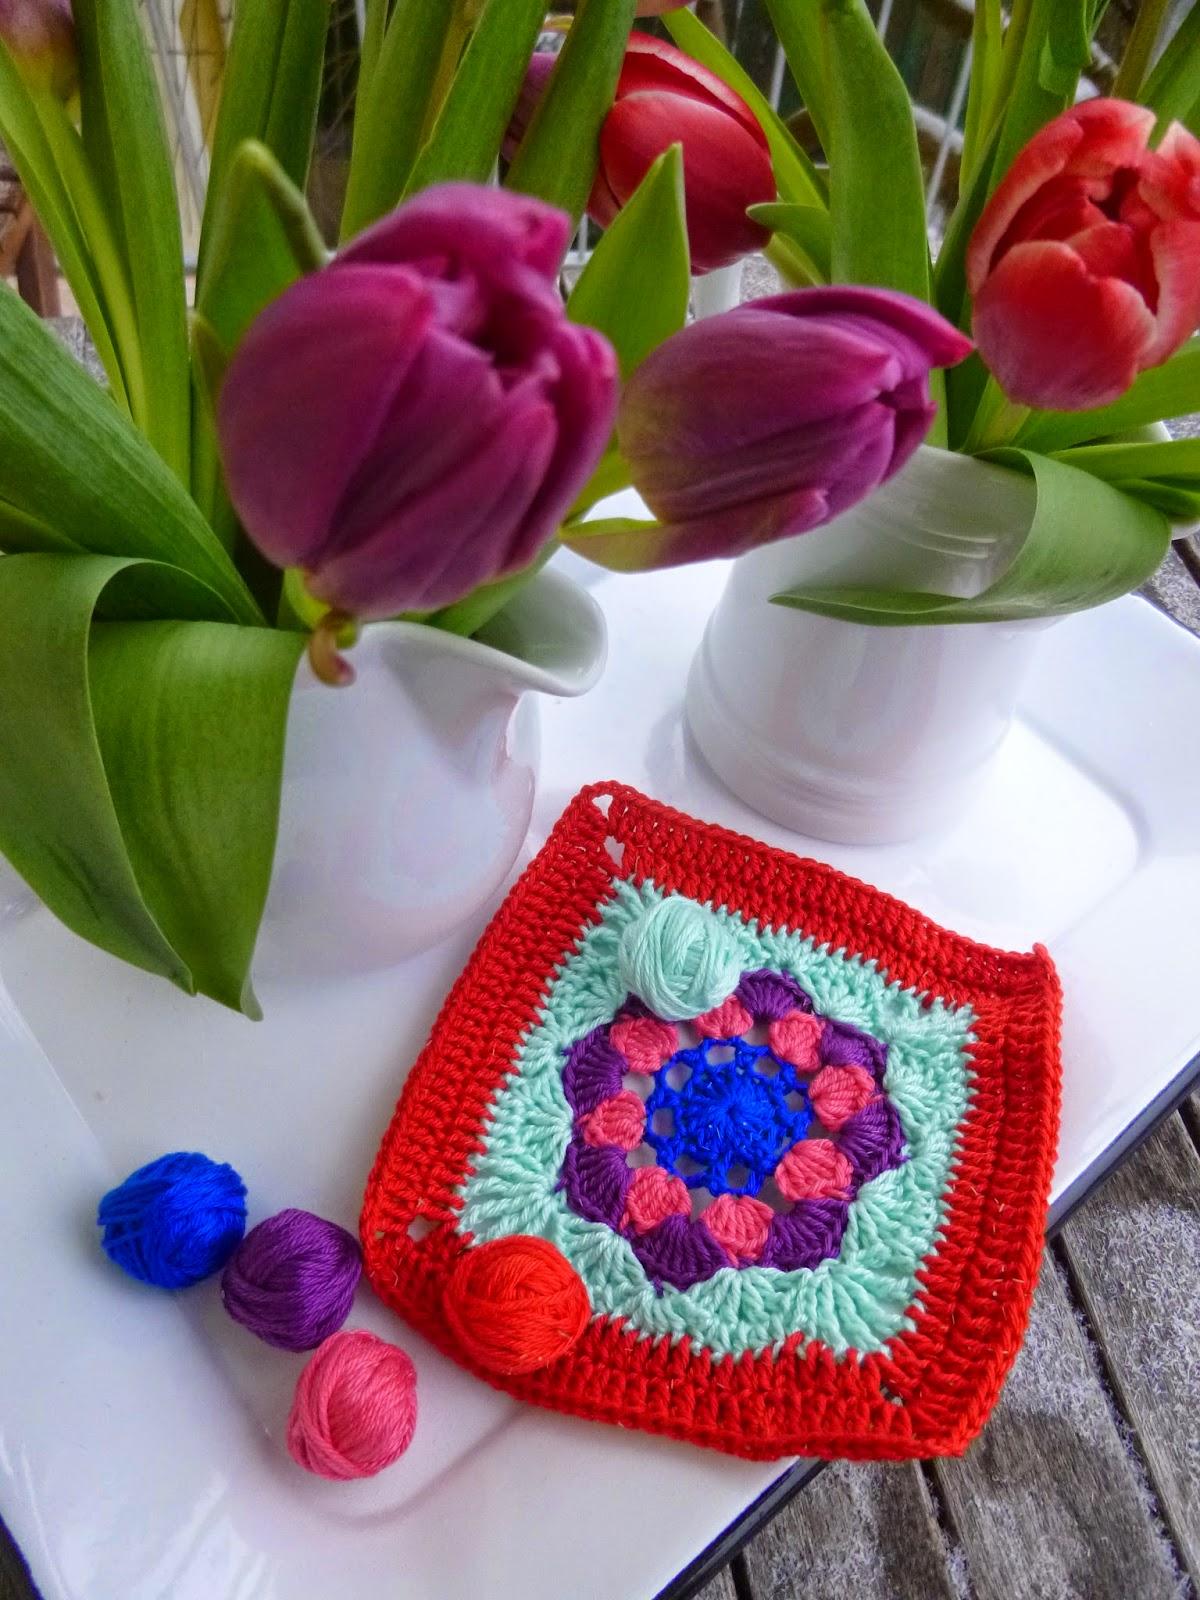 Dorable Häkeln Tulpe Blumenmuster Frieze - Decke Stricken Muster ...